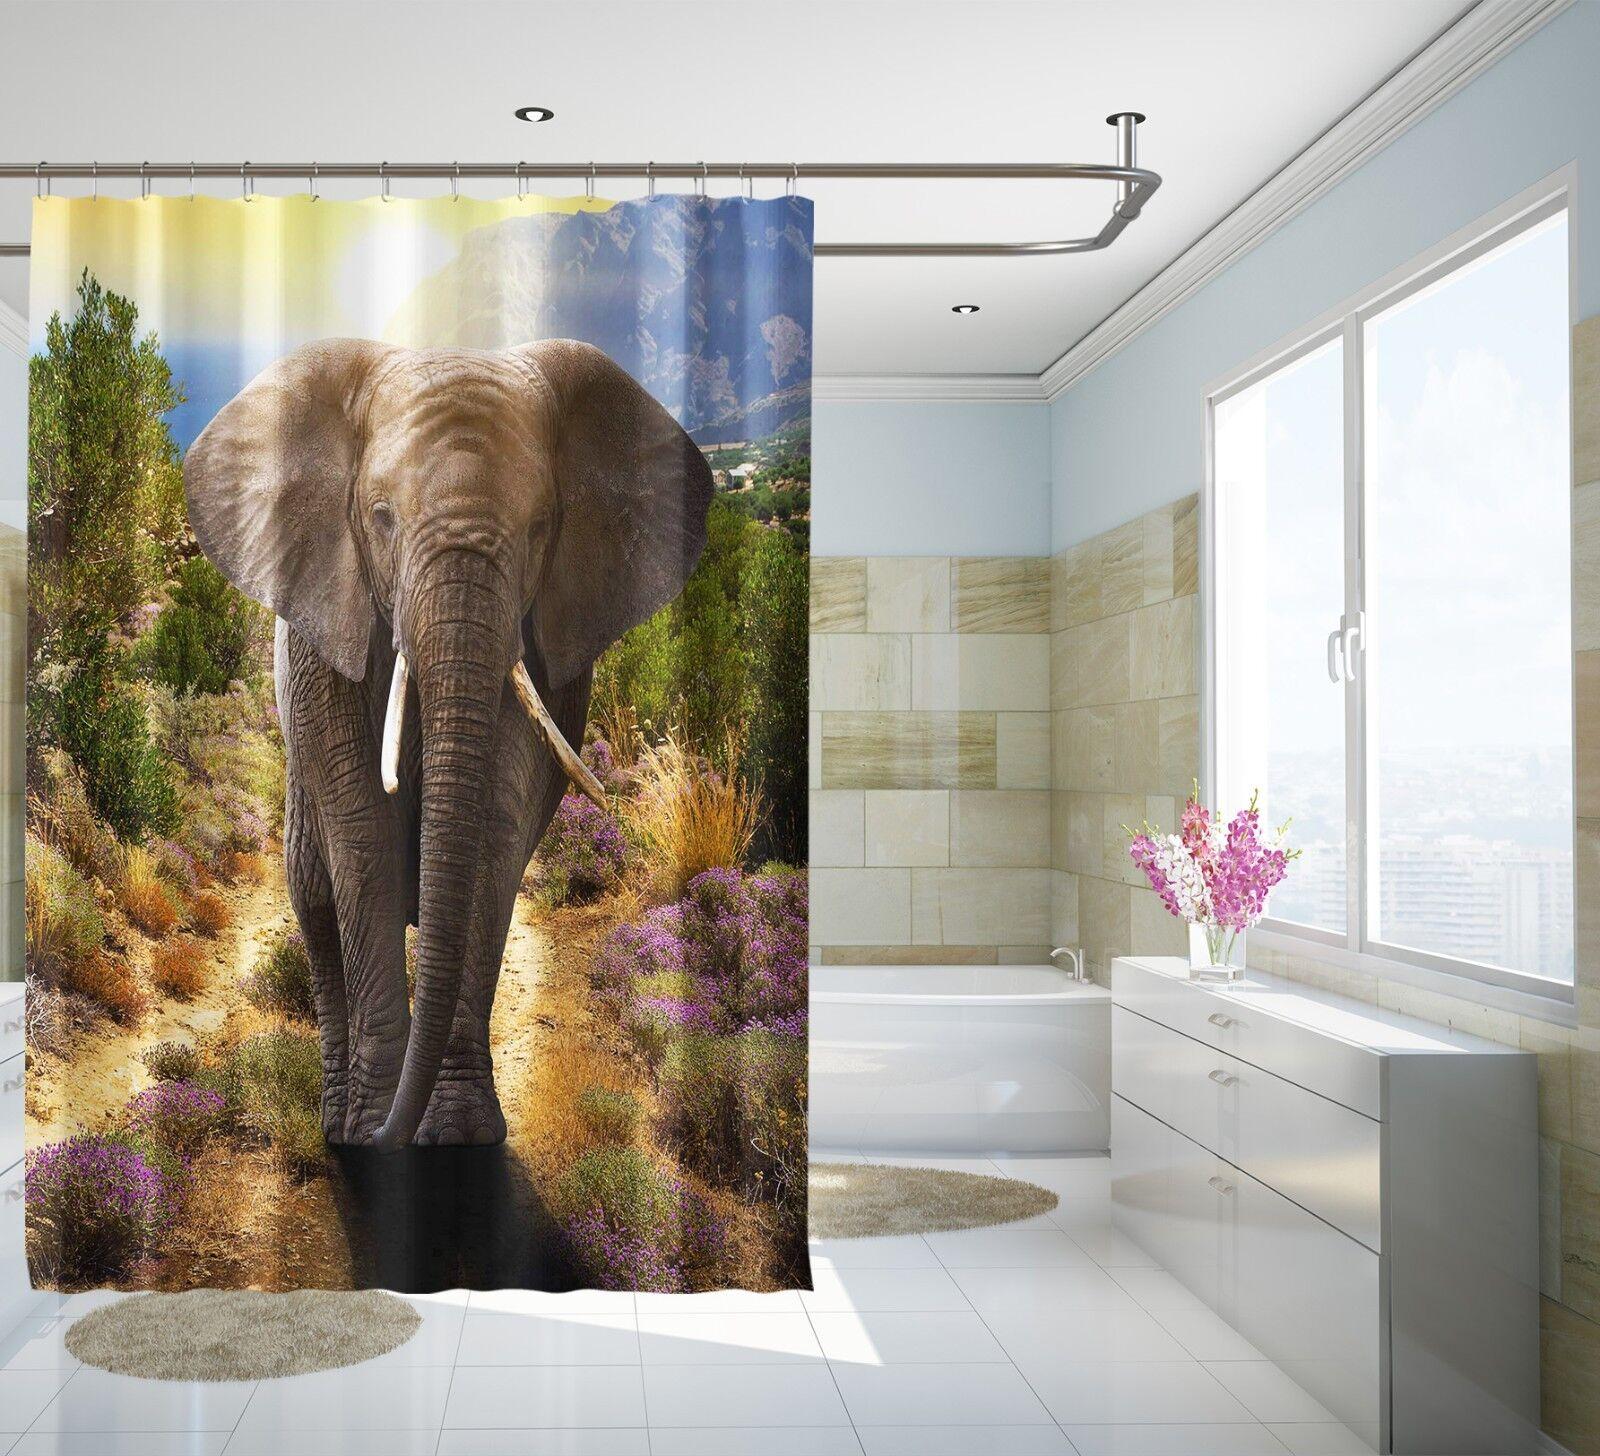 3D Elefante OFFERTA 2 Tenda da doccia IMPERMEABILE Fibra Bagno WC CASA FINESTRE